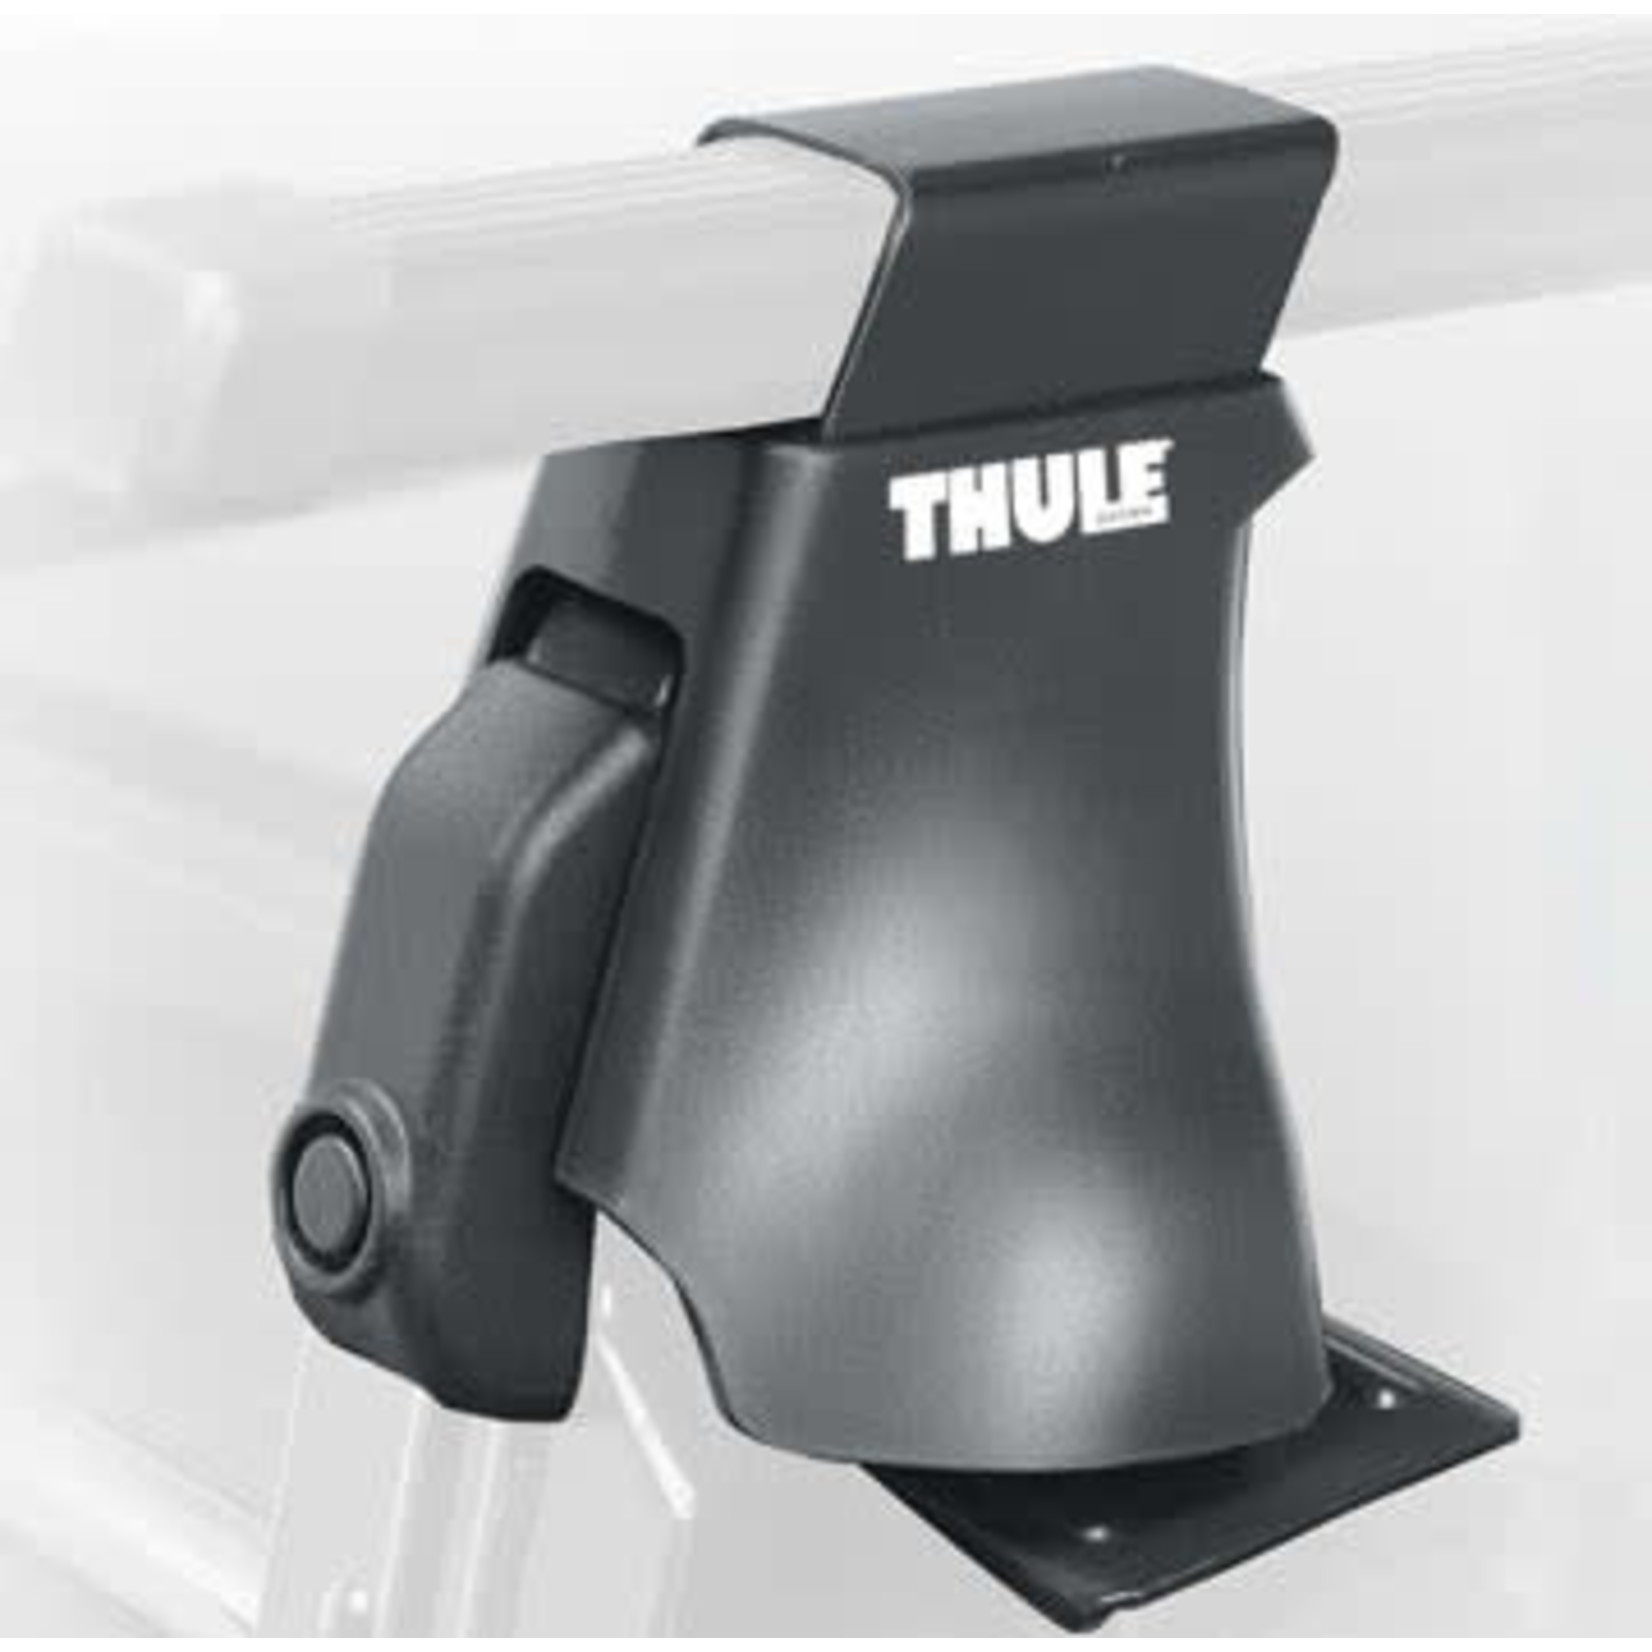 Thule Thule 400XT Aero Foot Pack Load Bar Tower Set: Fits Rectangular Bar; 4-Pack